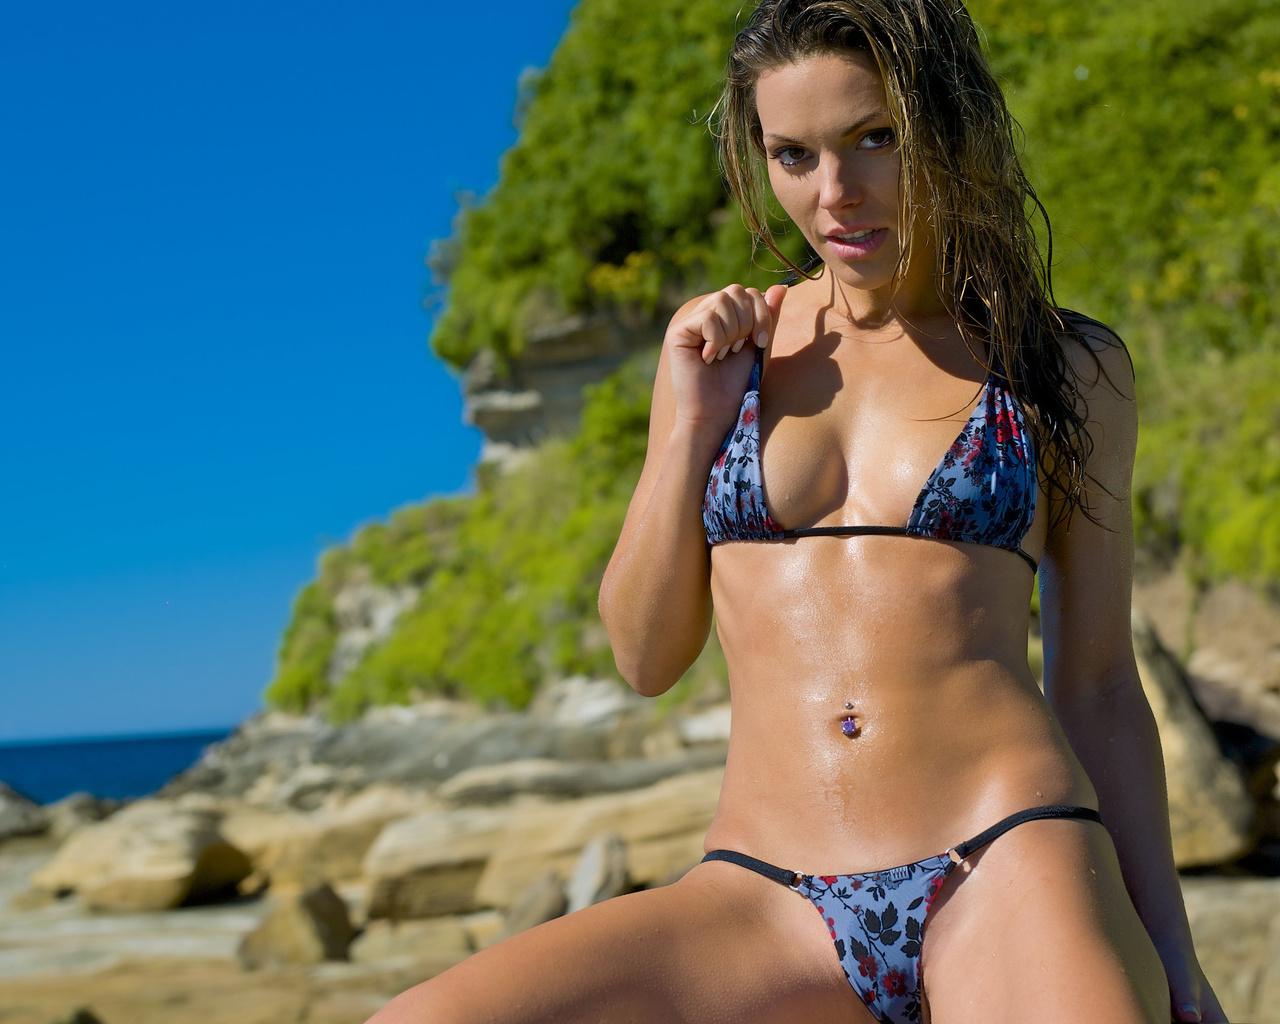 bikini-models-handjobs